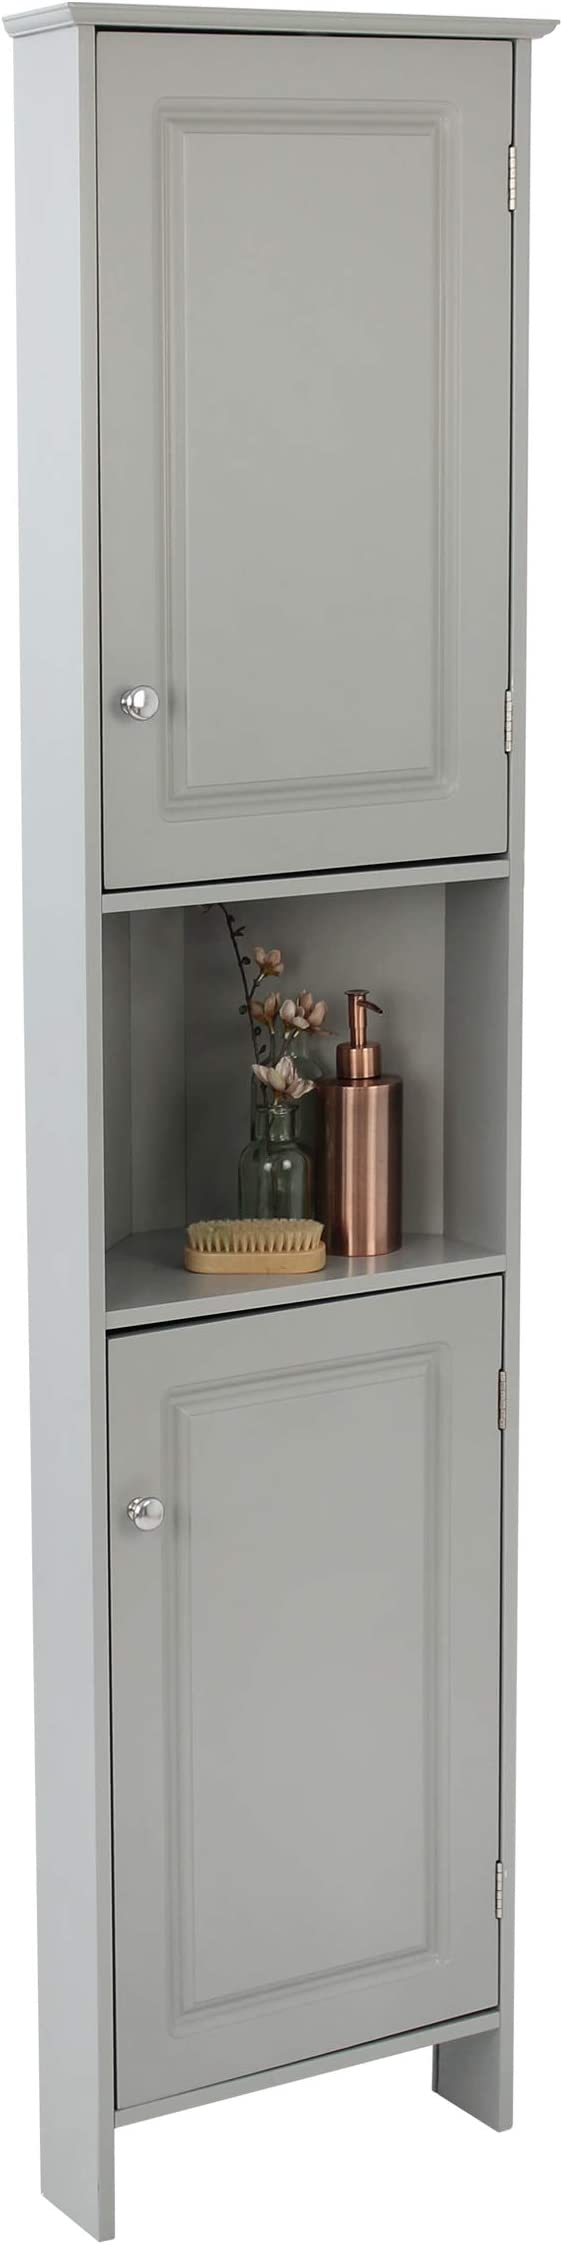 House Homestyle Tall Corner Bathroom Cabinet H 150cm X W 37cm X D 24 5cm Amazon Co Uk Kitchen Home